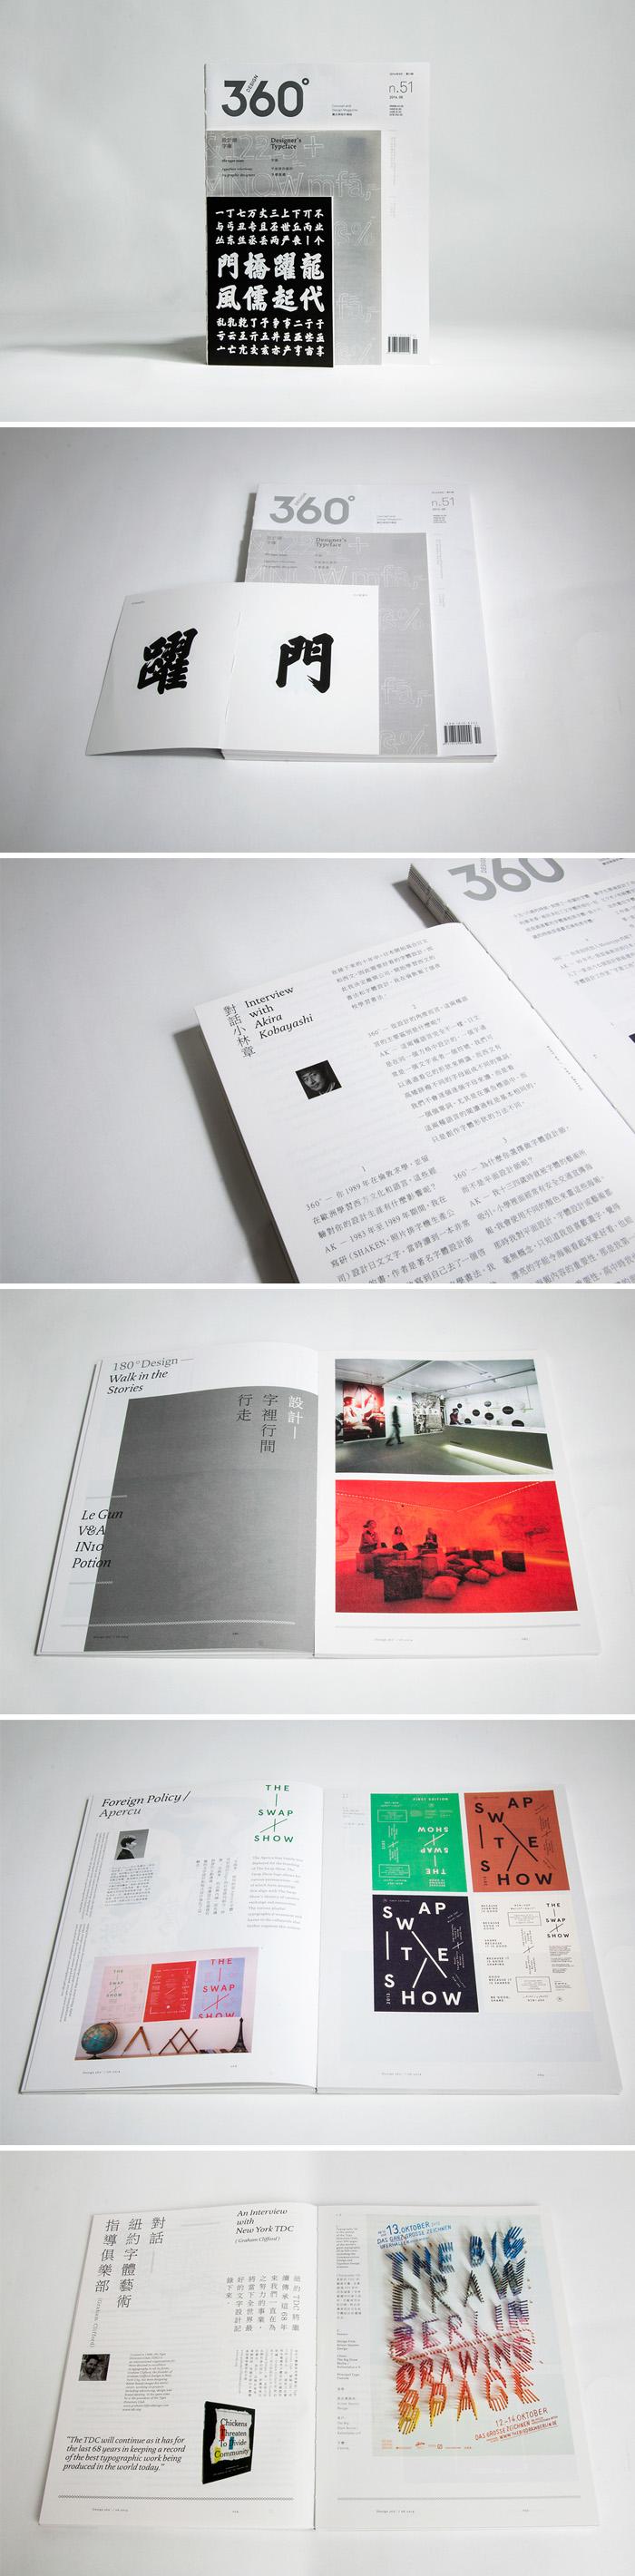 Design 360° Magazine #51 - Designer's Typeface 設計師字體庫 | Rose QR LIN, 2014 //Manbo